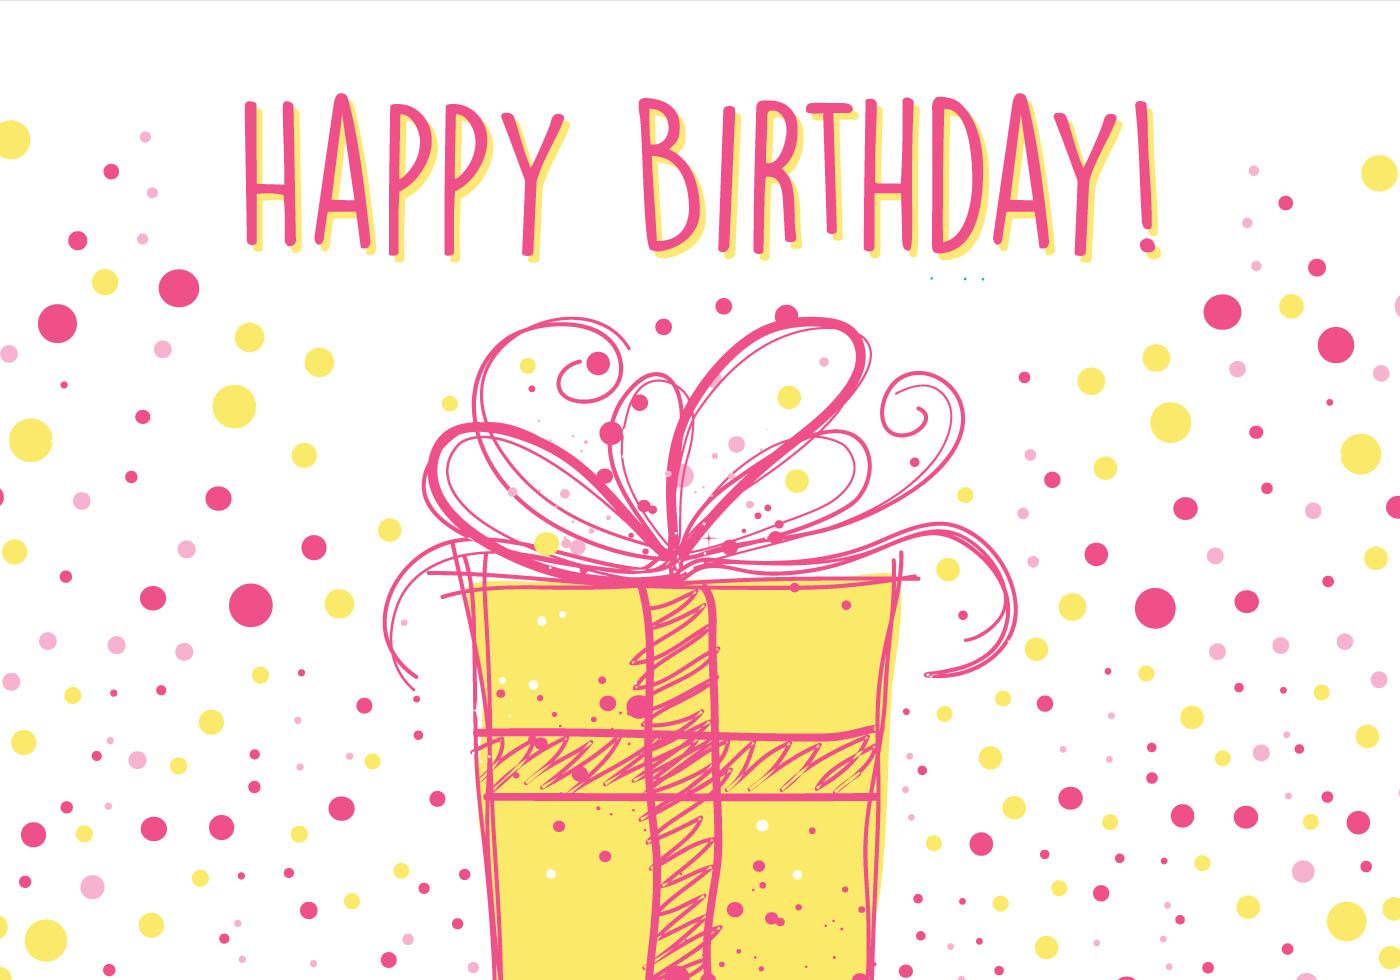 Birthday Card Design Download Free Vector Art Stock